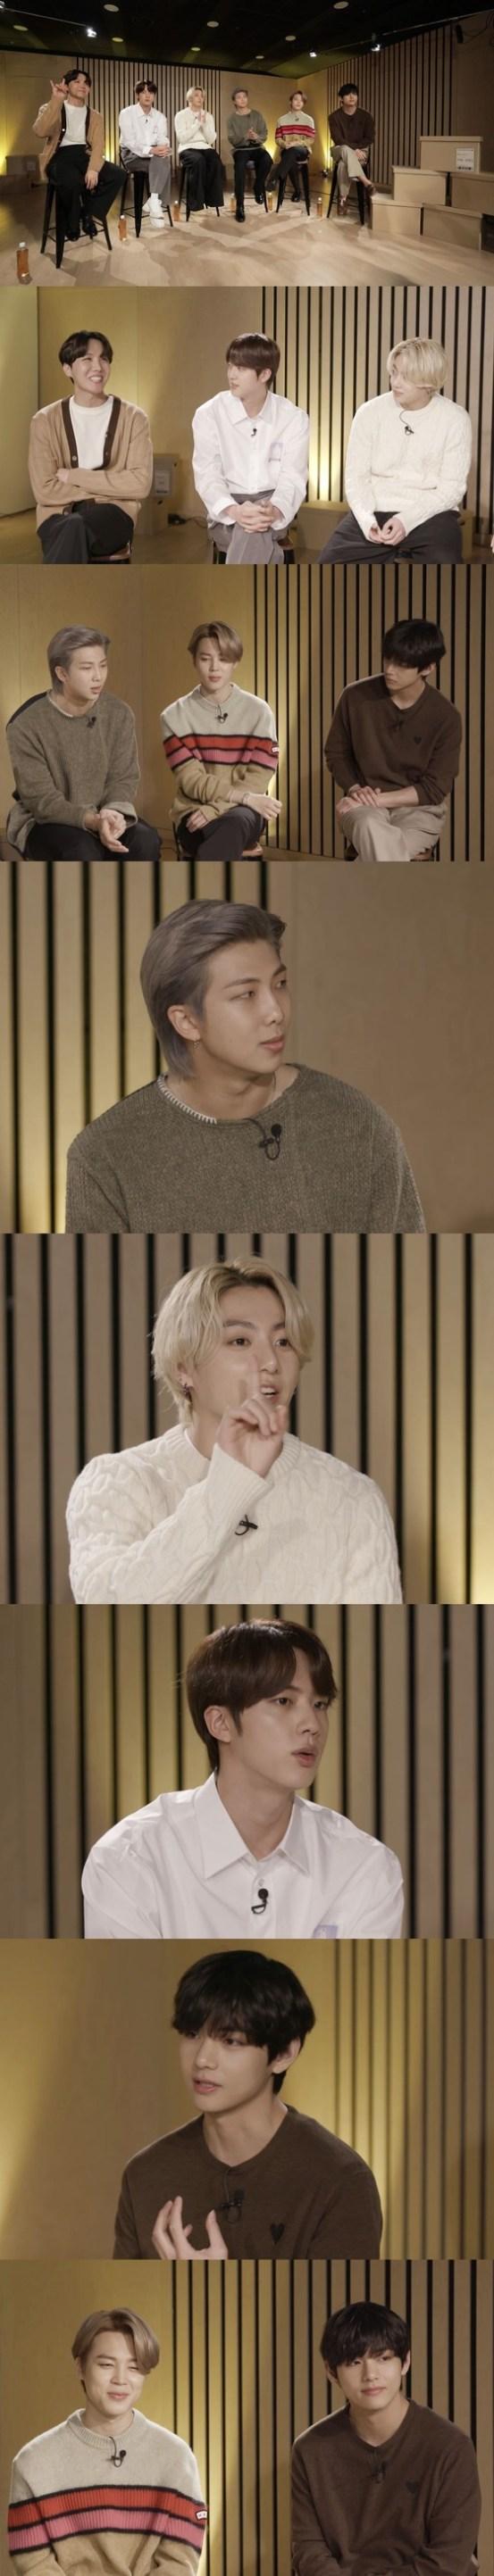 "[N컷] '아카이브 K'BTS ""빌보드 뮤직 어워드 첫 입상 너무 무서웠 어"""